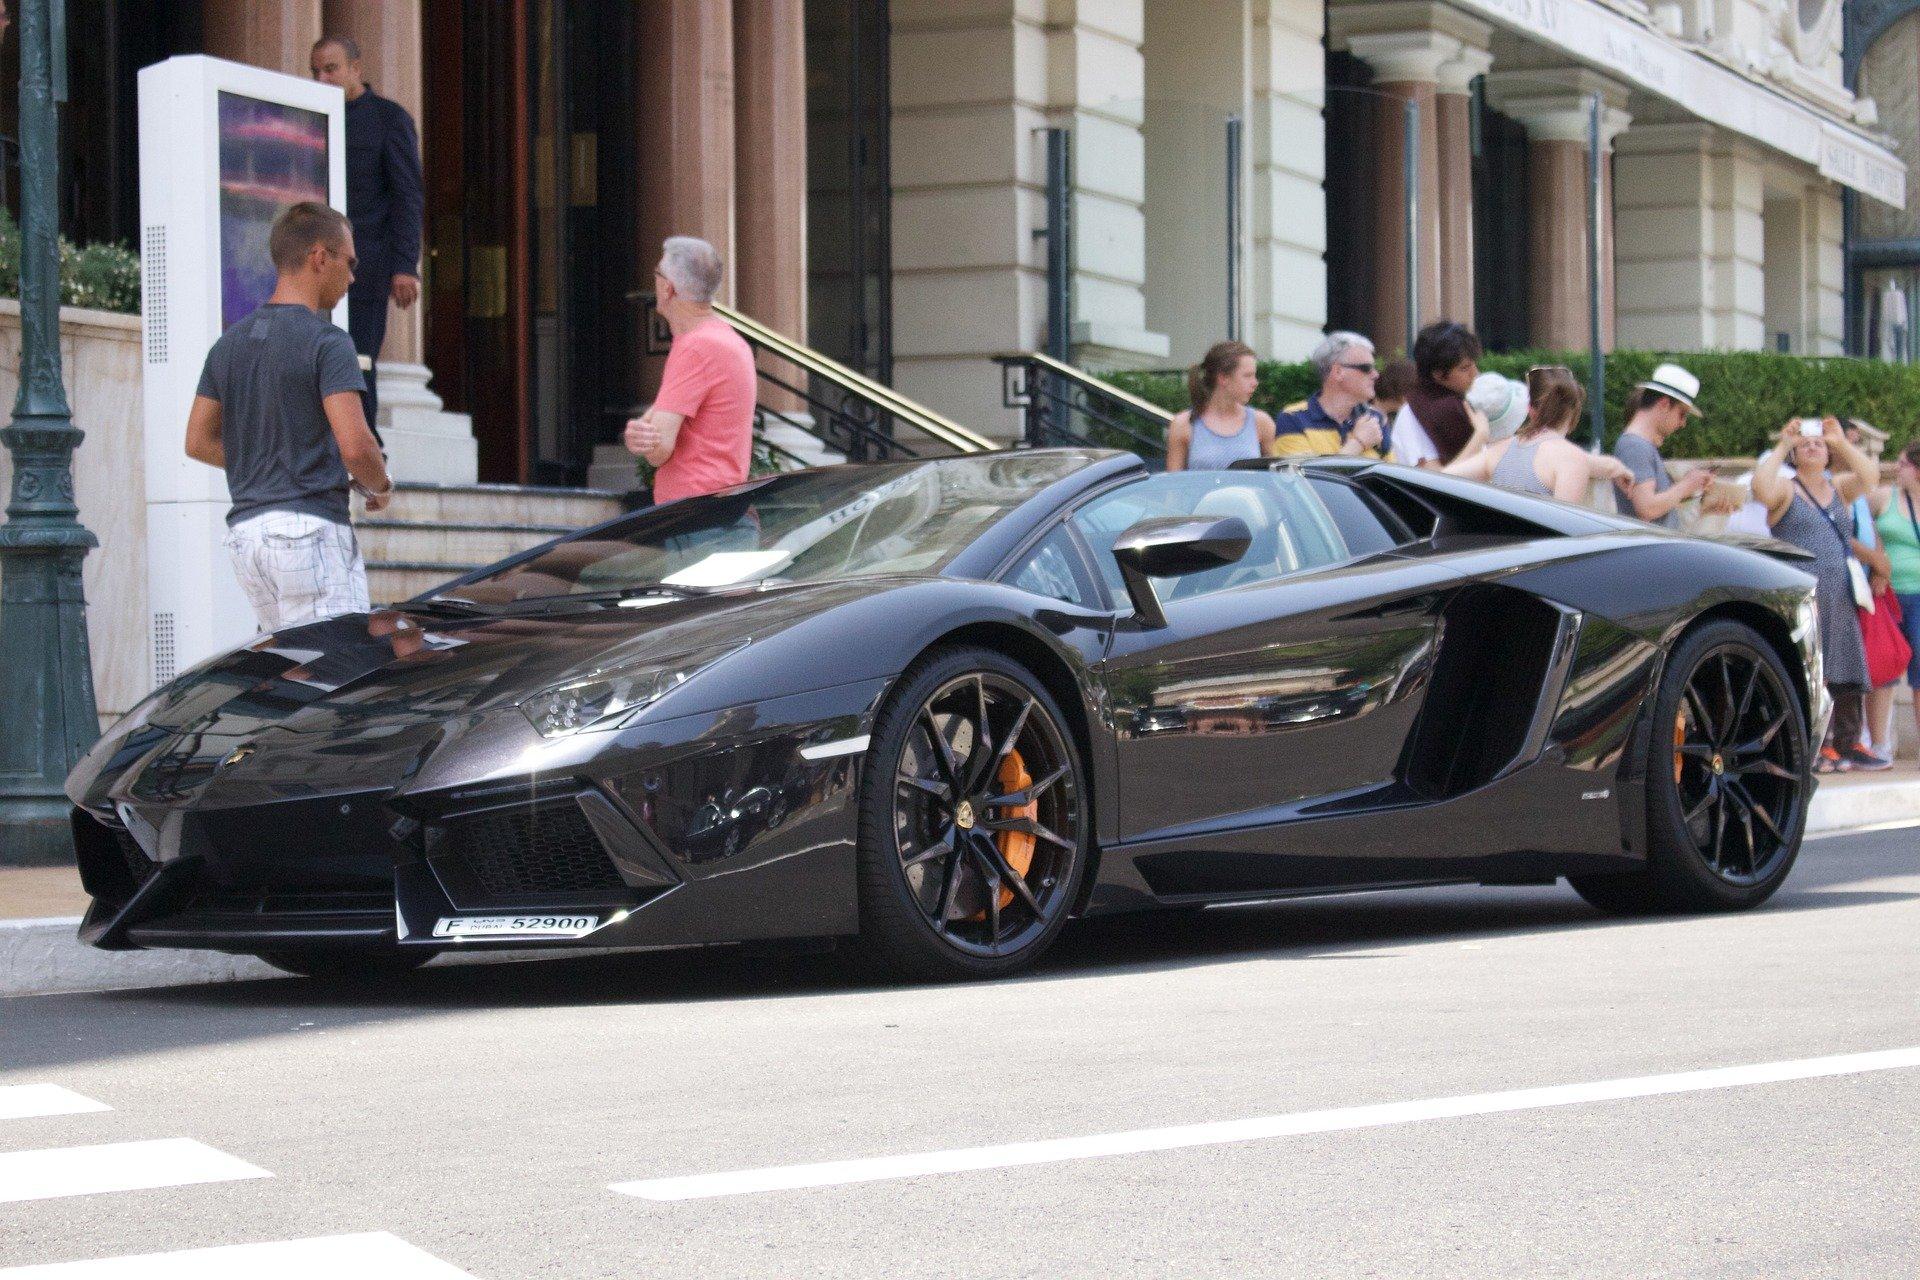 Lamborghini als Kapitalanlage kaufen: Top10 der teuersten Lamborghini Modelle